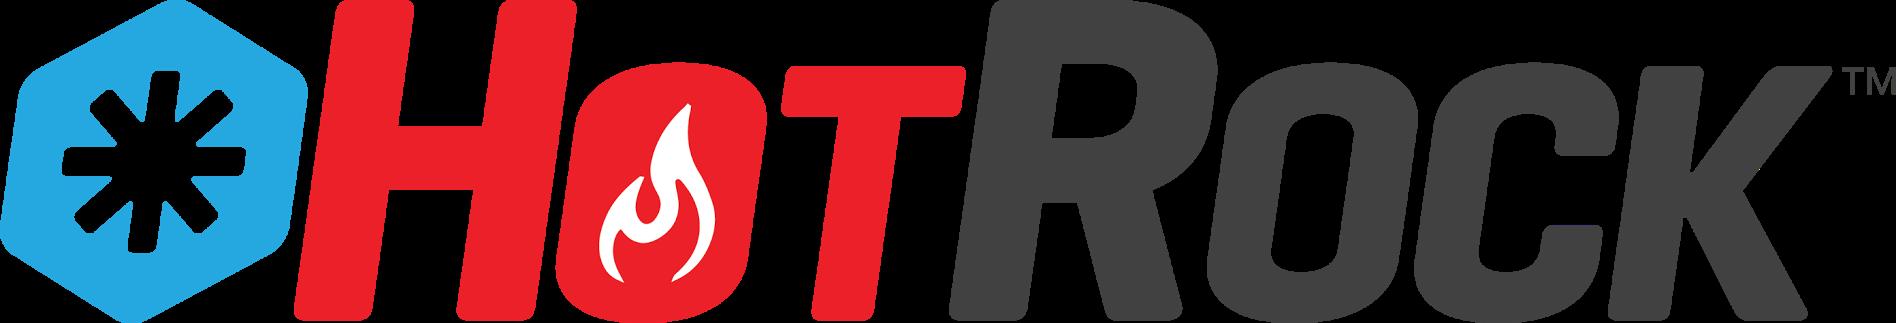 HotRock Logo